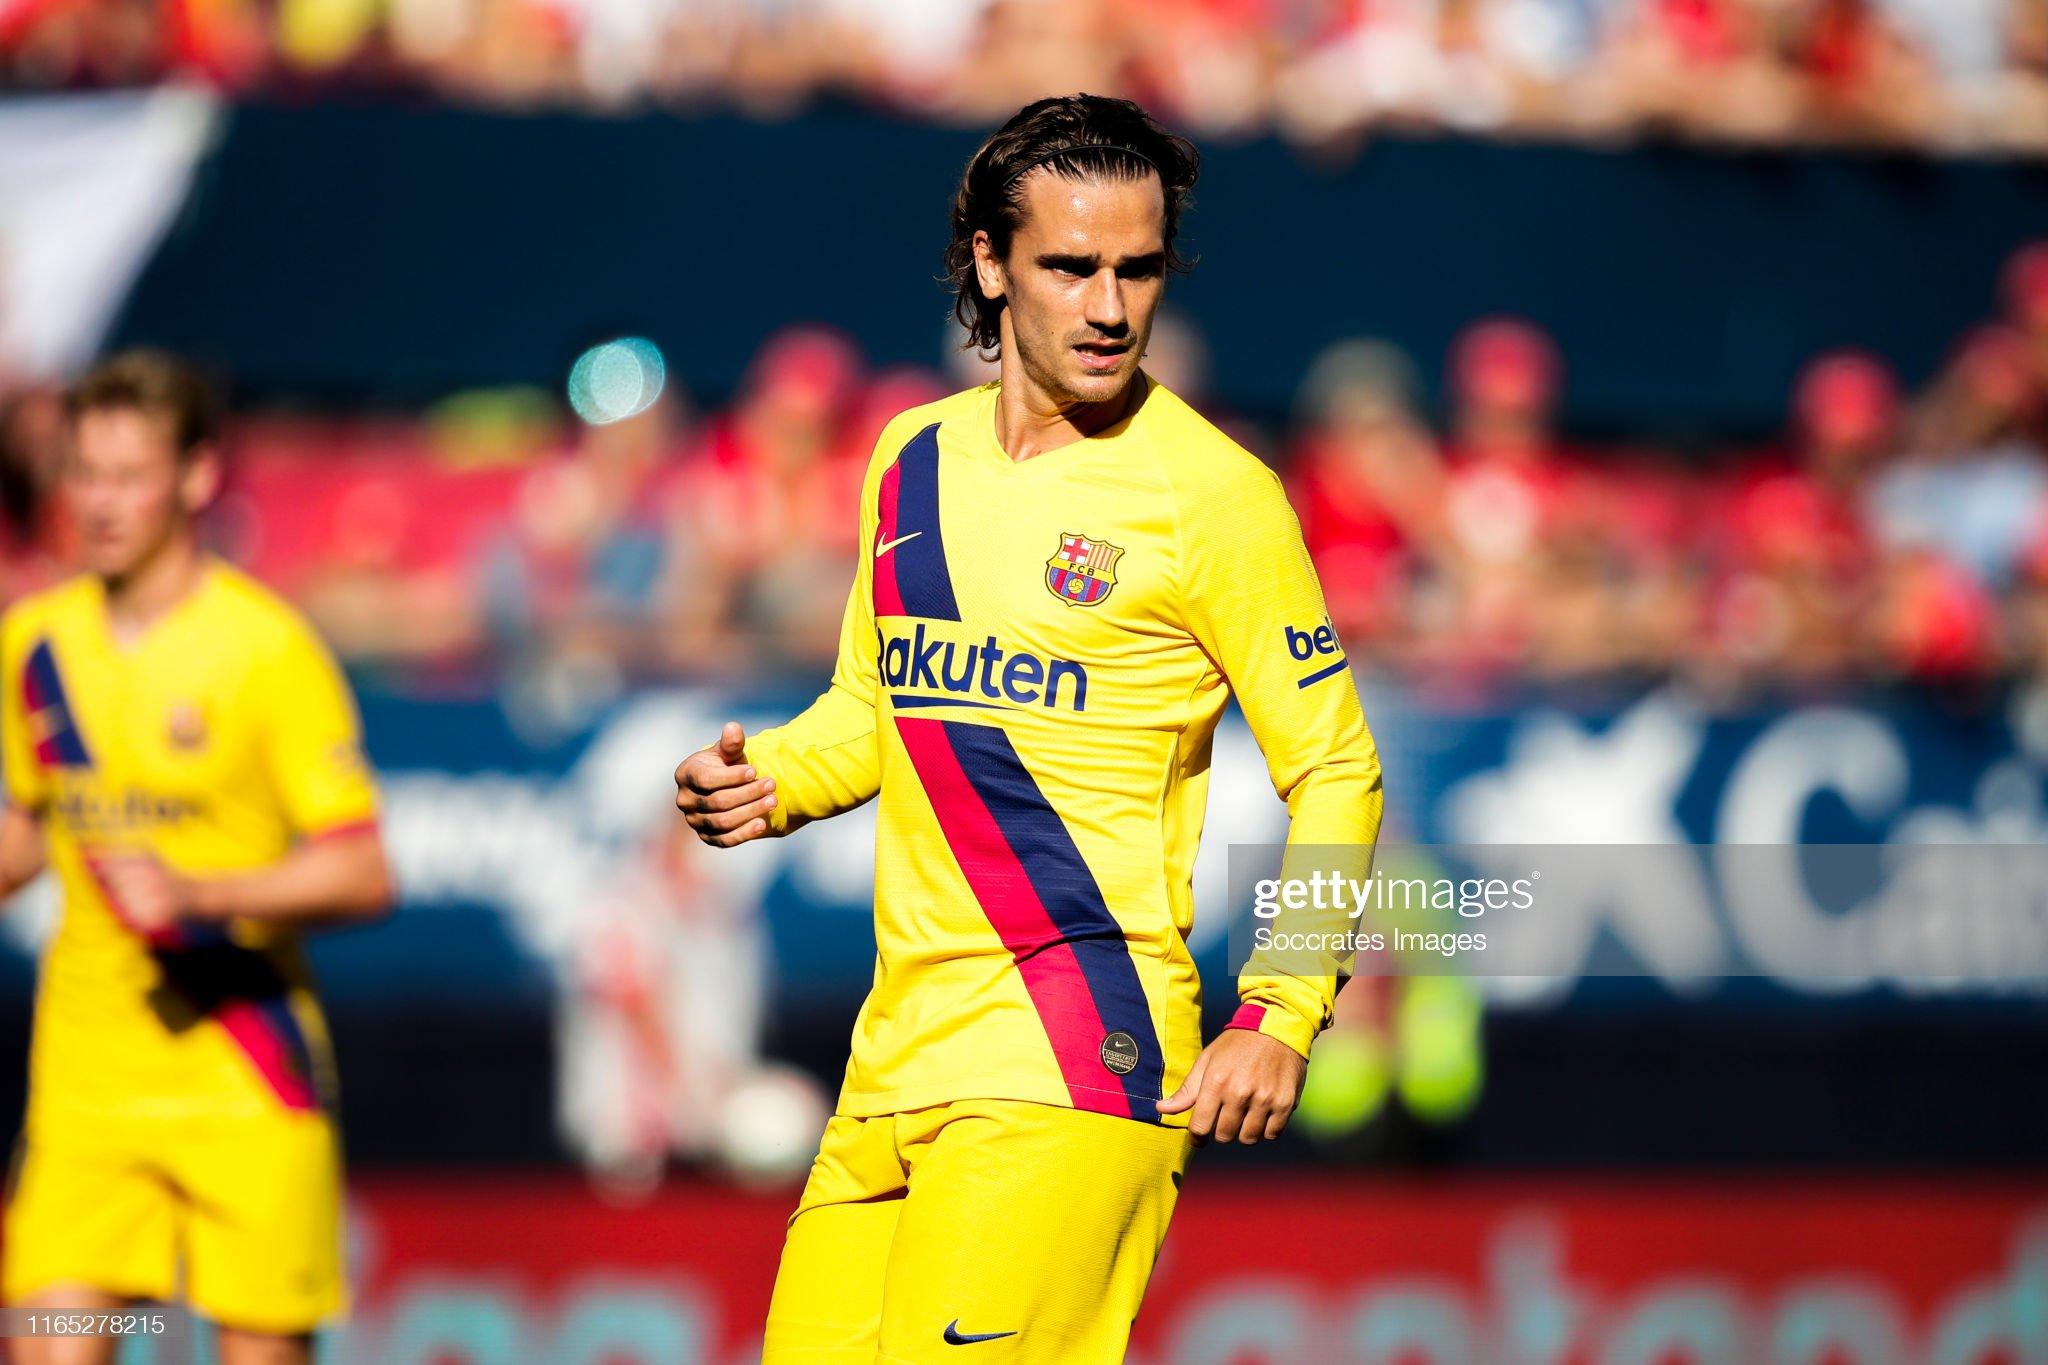 صور مباراة : أوساسونا - برشلونة 2-2 ( 31-08-2019 )  Antoine-griezmann-of-fc-barcelona-during-the-la-liga-santander-match-picture-id1165278215?s=2048x2048